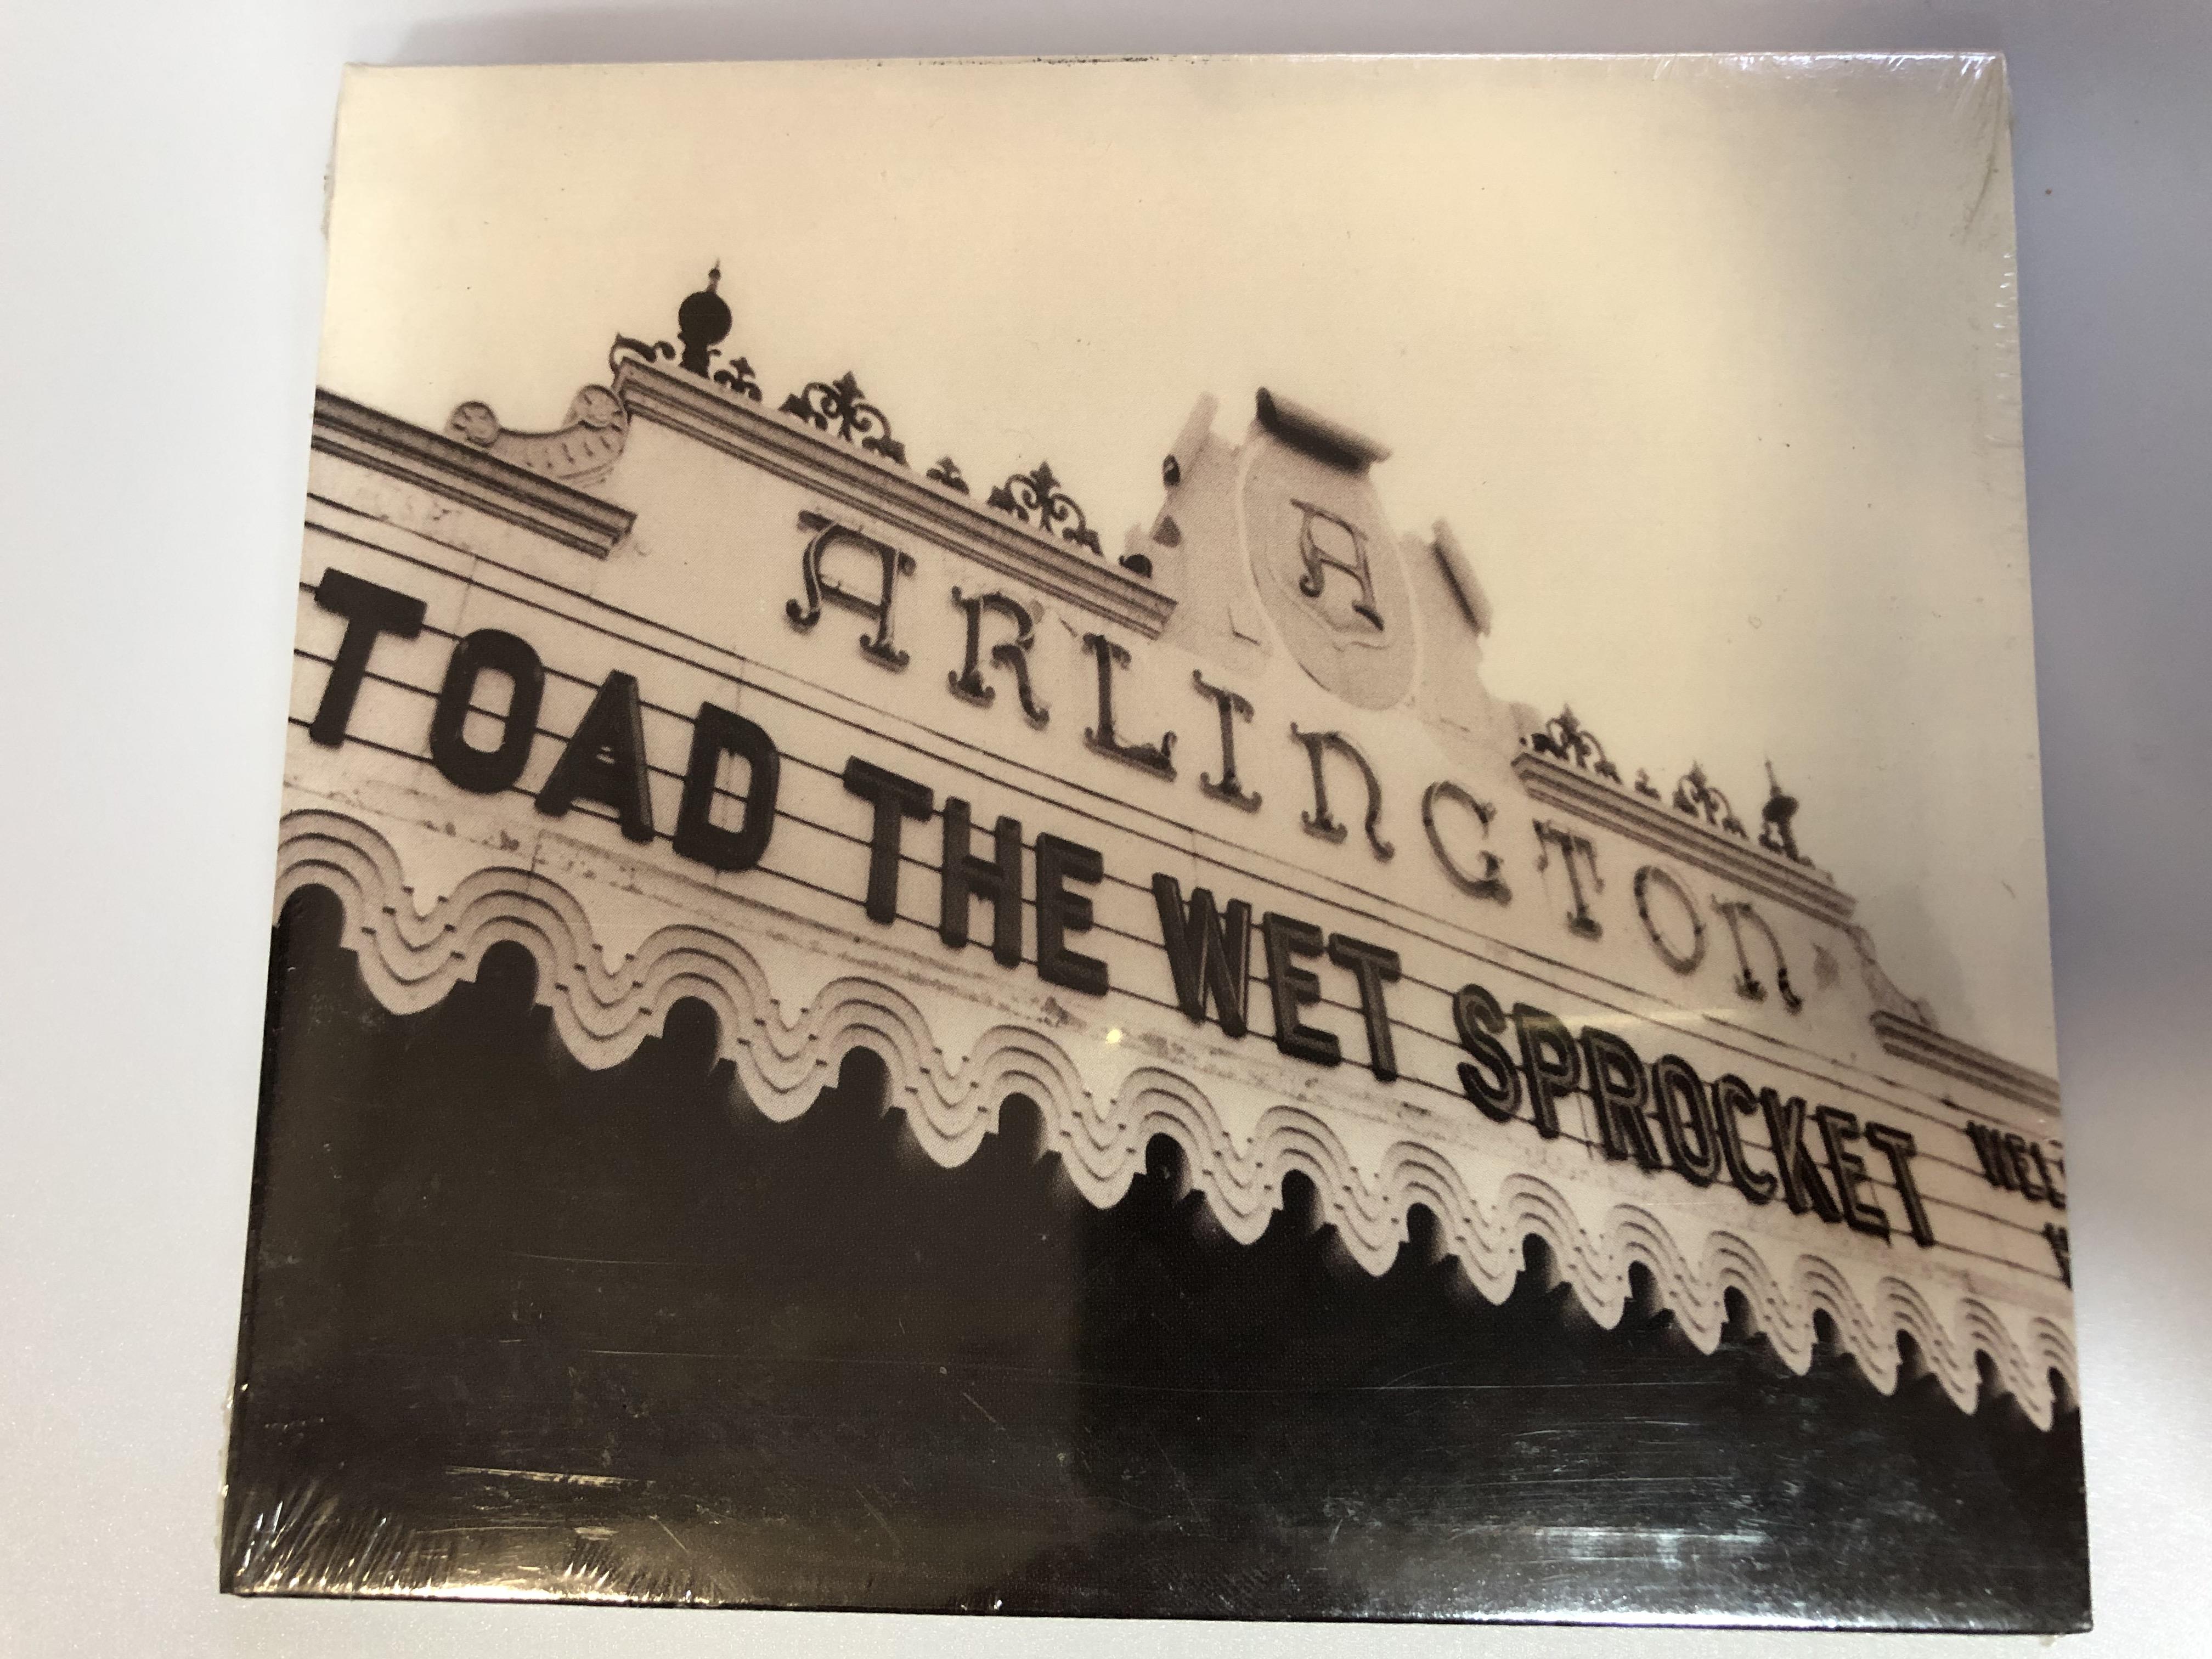 arlington-toad-the-wet-sprocket-columbia-audio-cd-2004-col-519315-2-1-.jpg